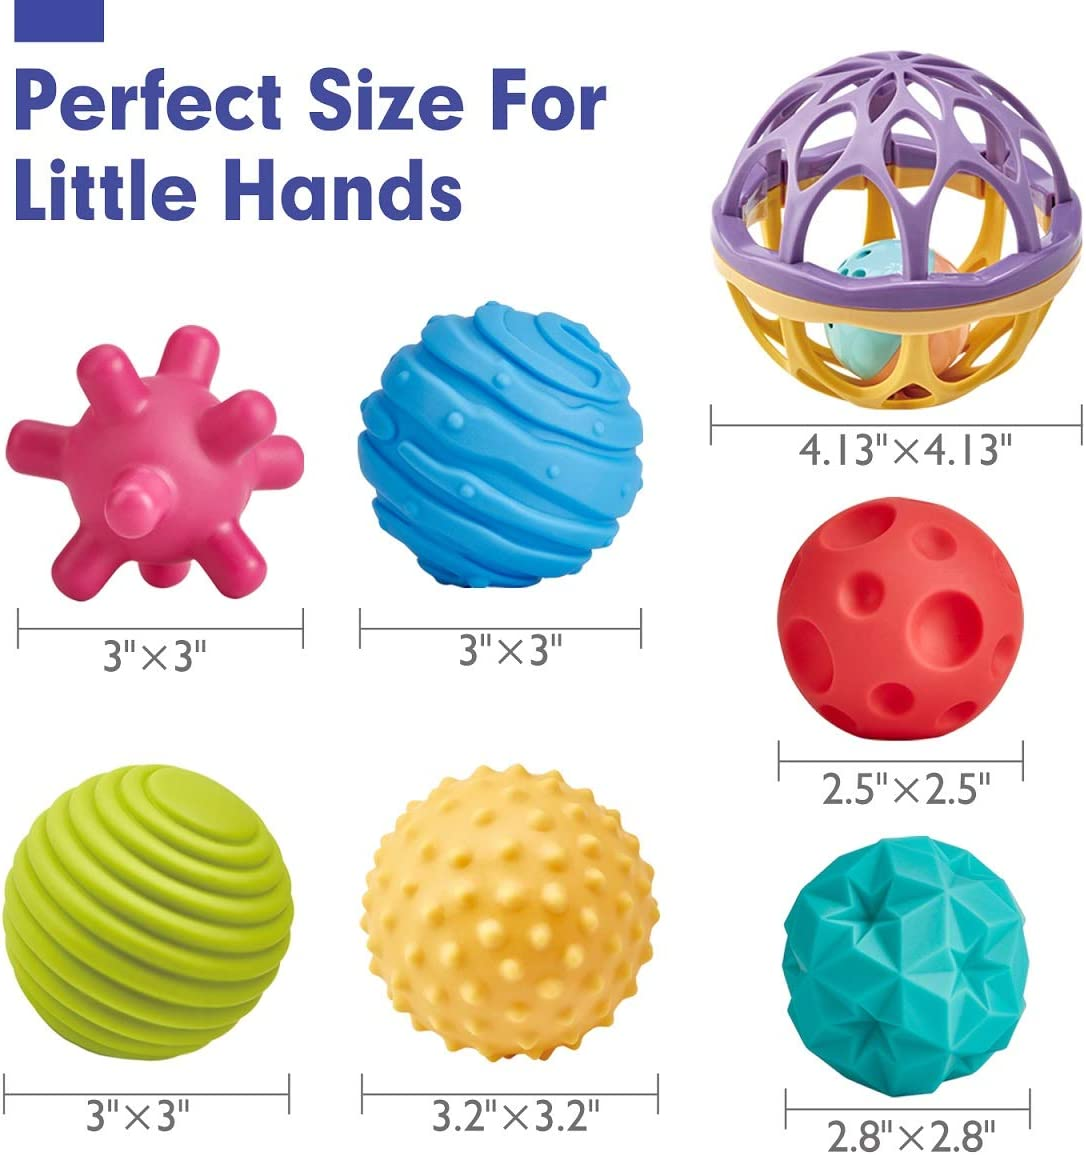 Hand Catching Balls Rattle Sensory Toys for Babies Infant Toy Sensory Developmental Newborn Baby Toys 6 to 12 Months CubicFun Baby Toys 3-6 Months Sensory Balls Multiple Textured Multicolor 7 Pieces